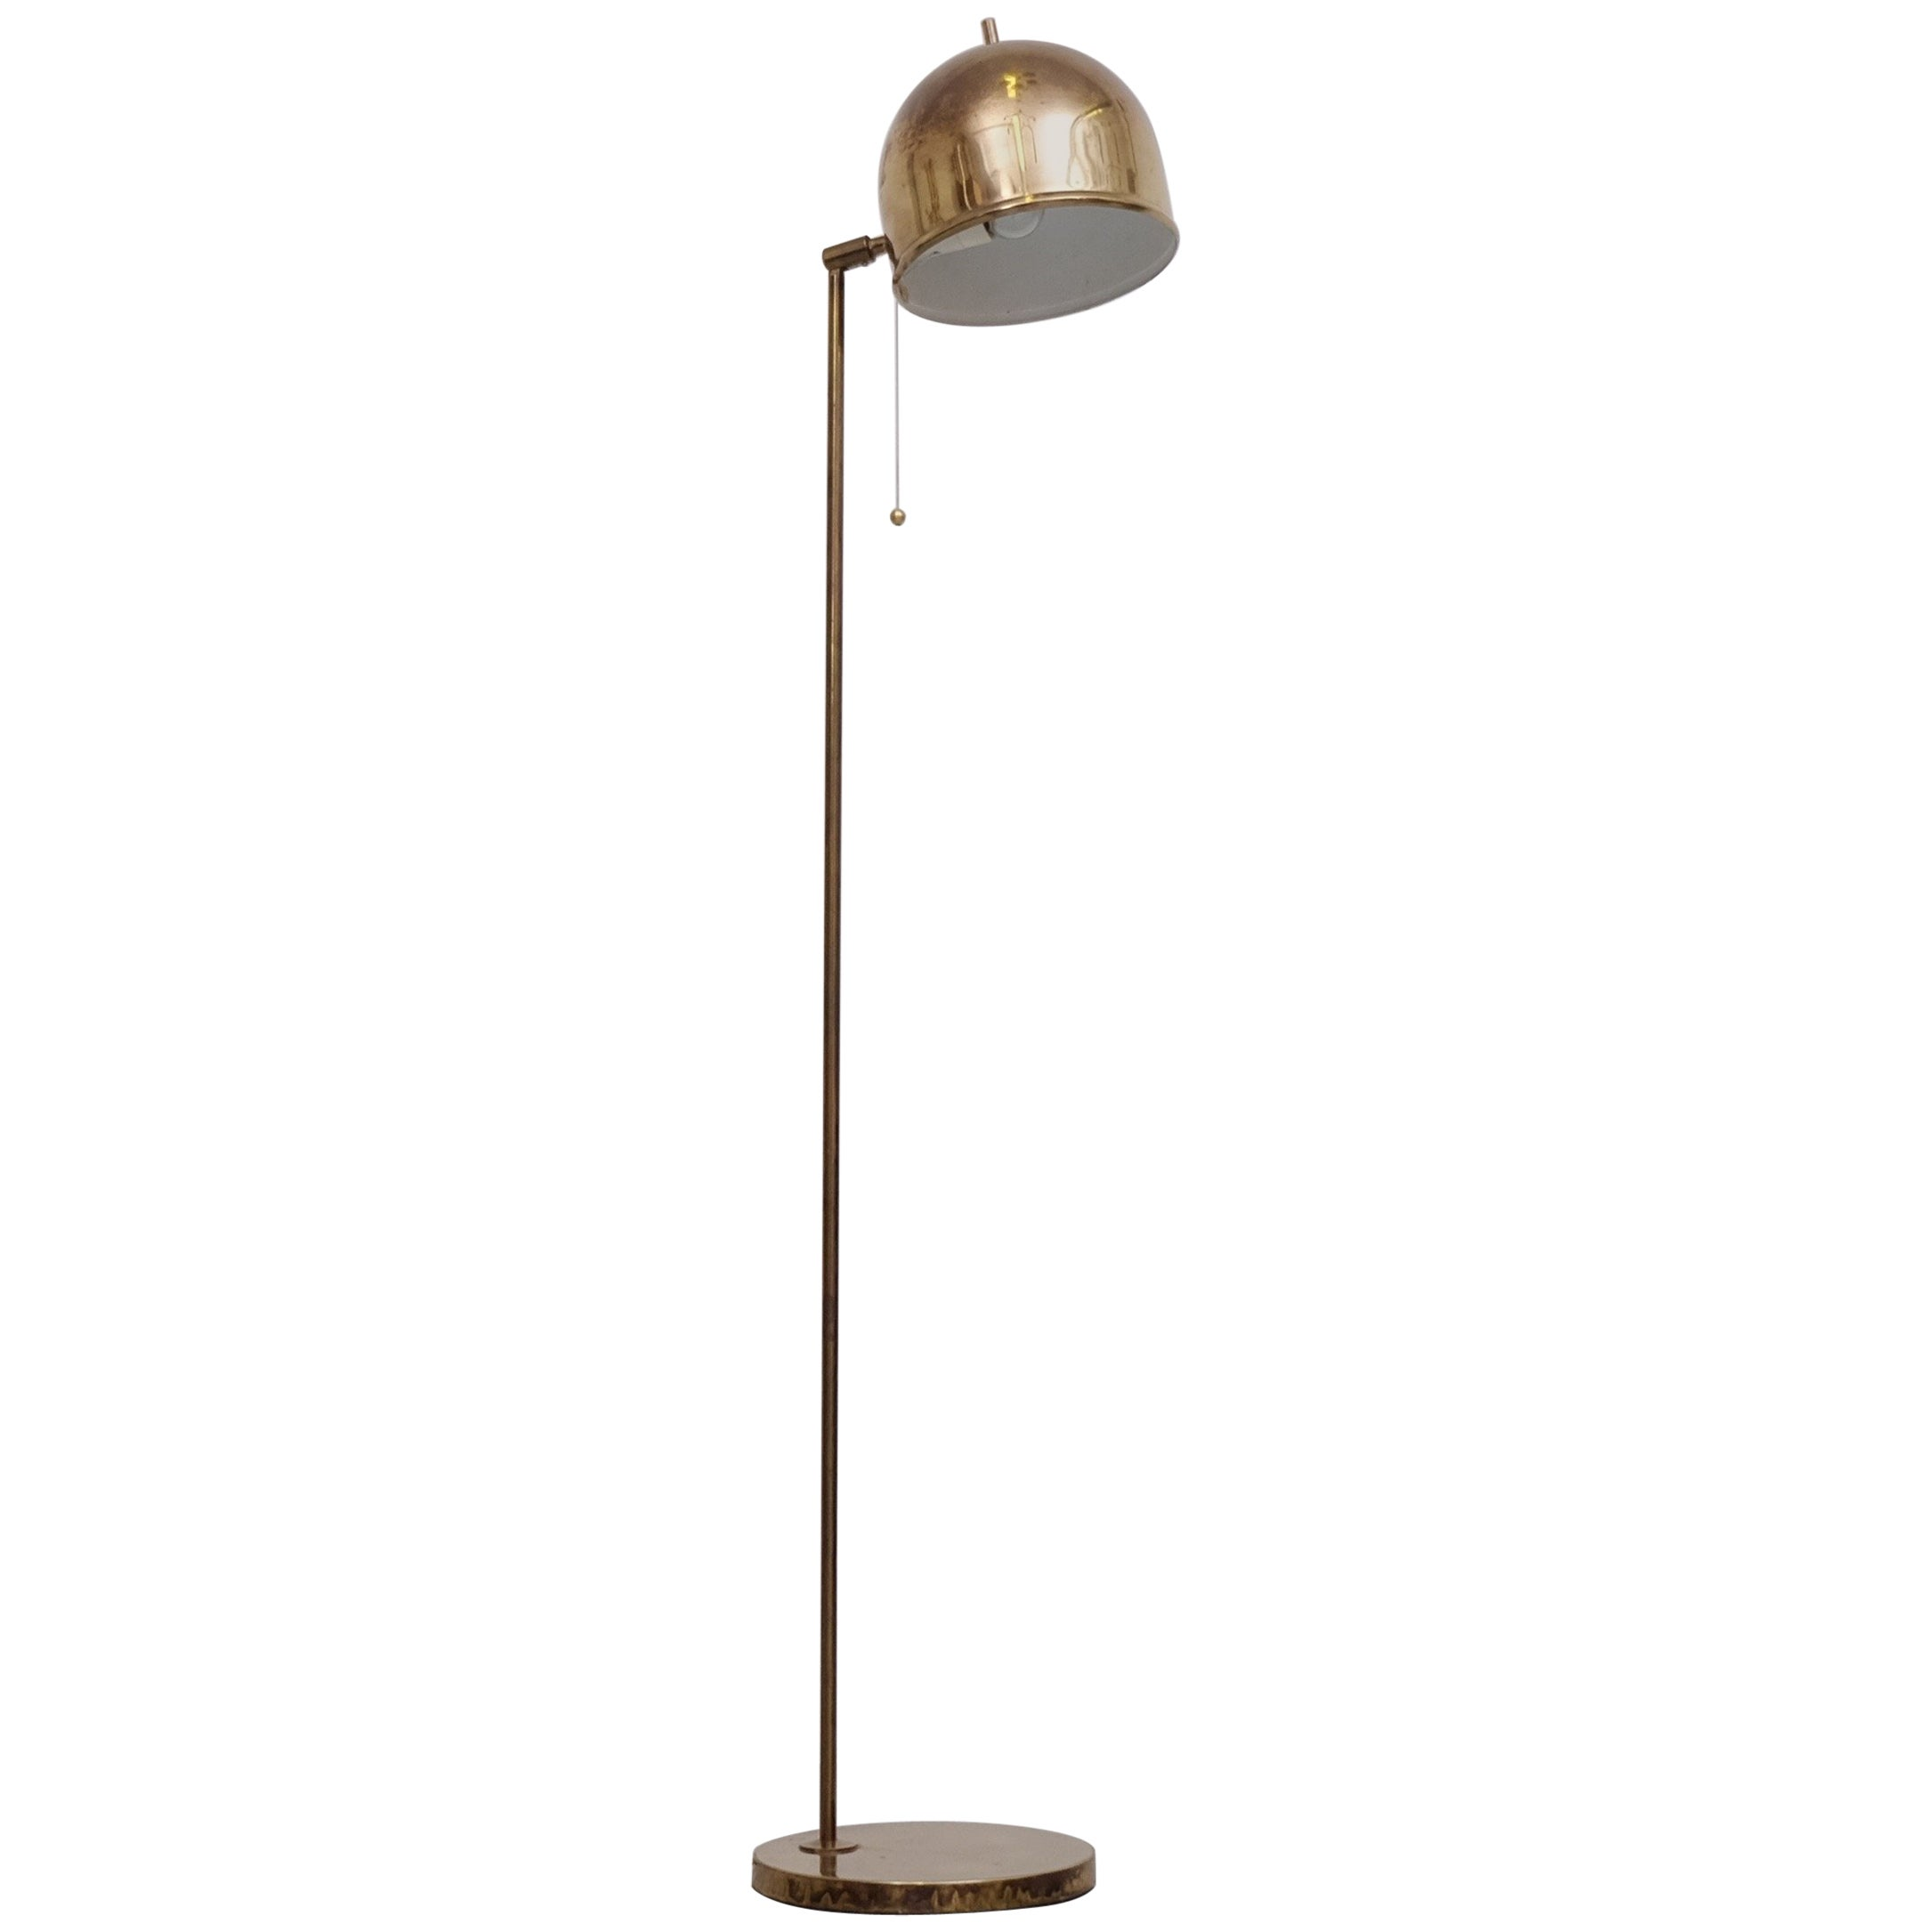 Brass Floor Lamp G-075 by Bergboms, 1960s